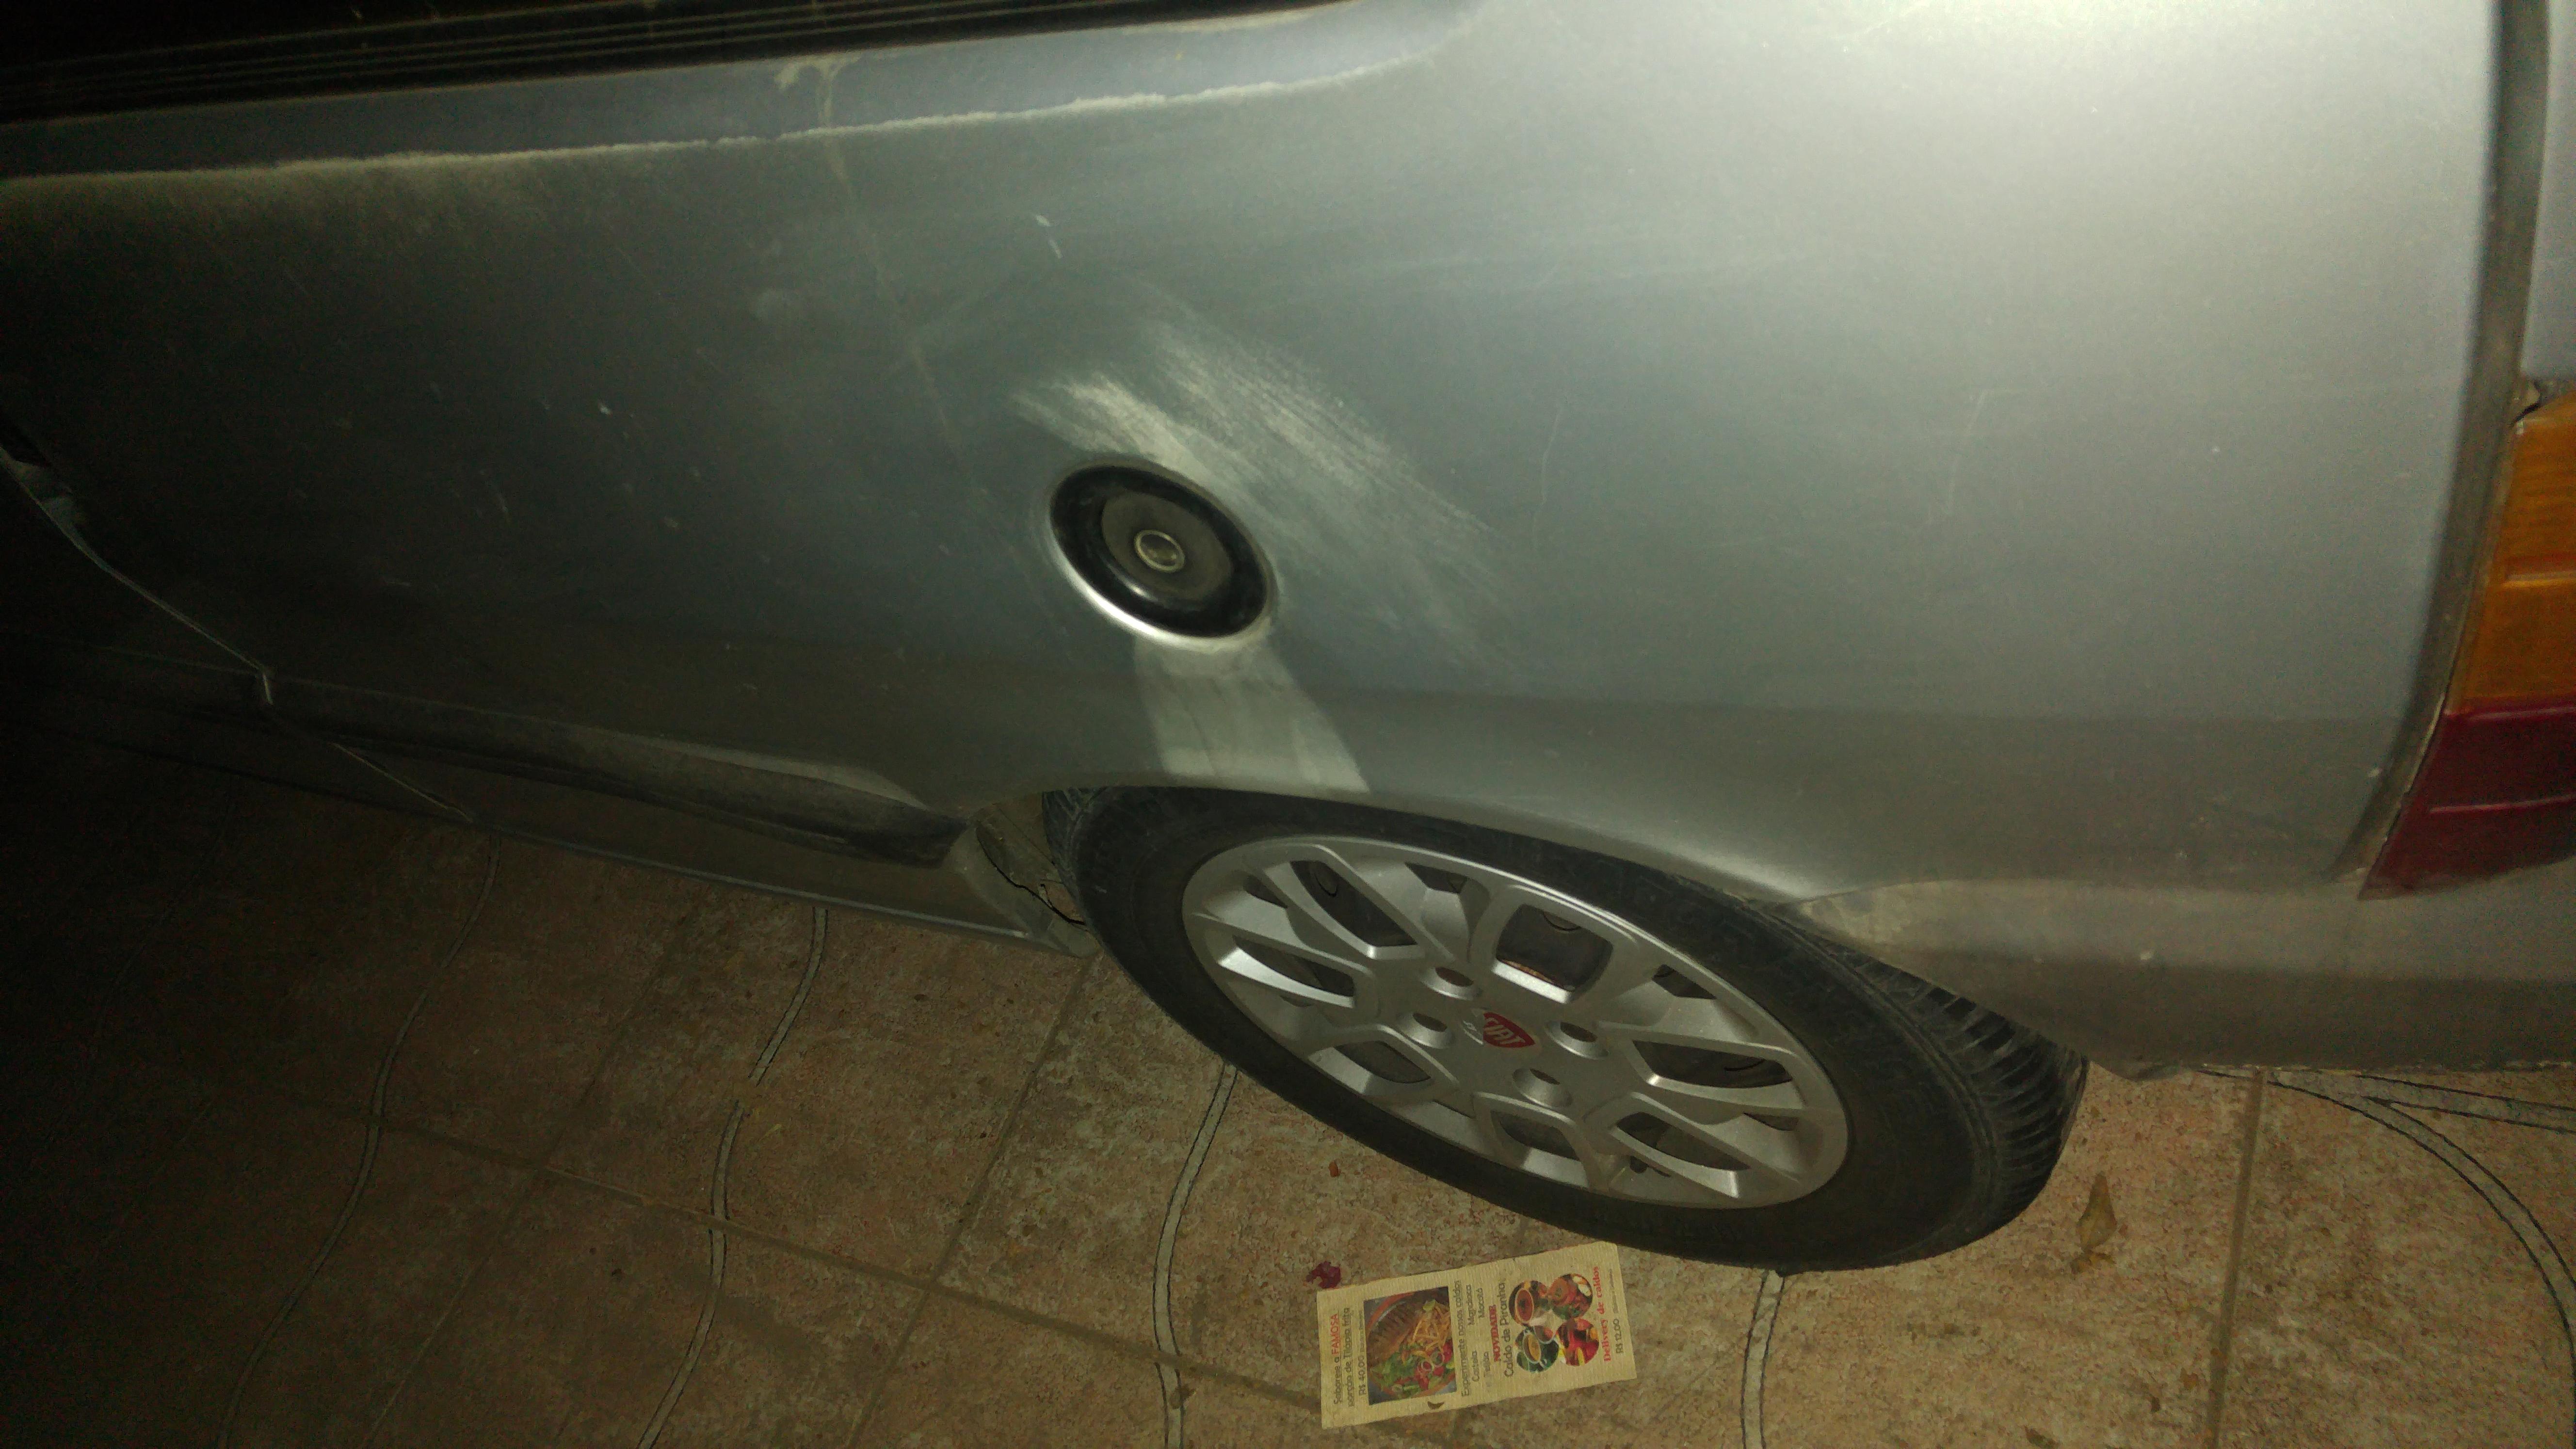 Duvida Susto Suspensao Traseira Estourou Clube Do Uno Brasil